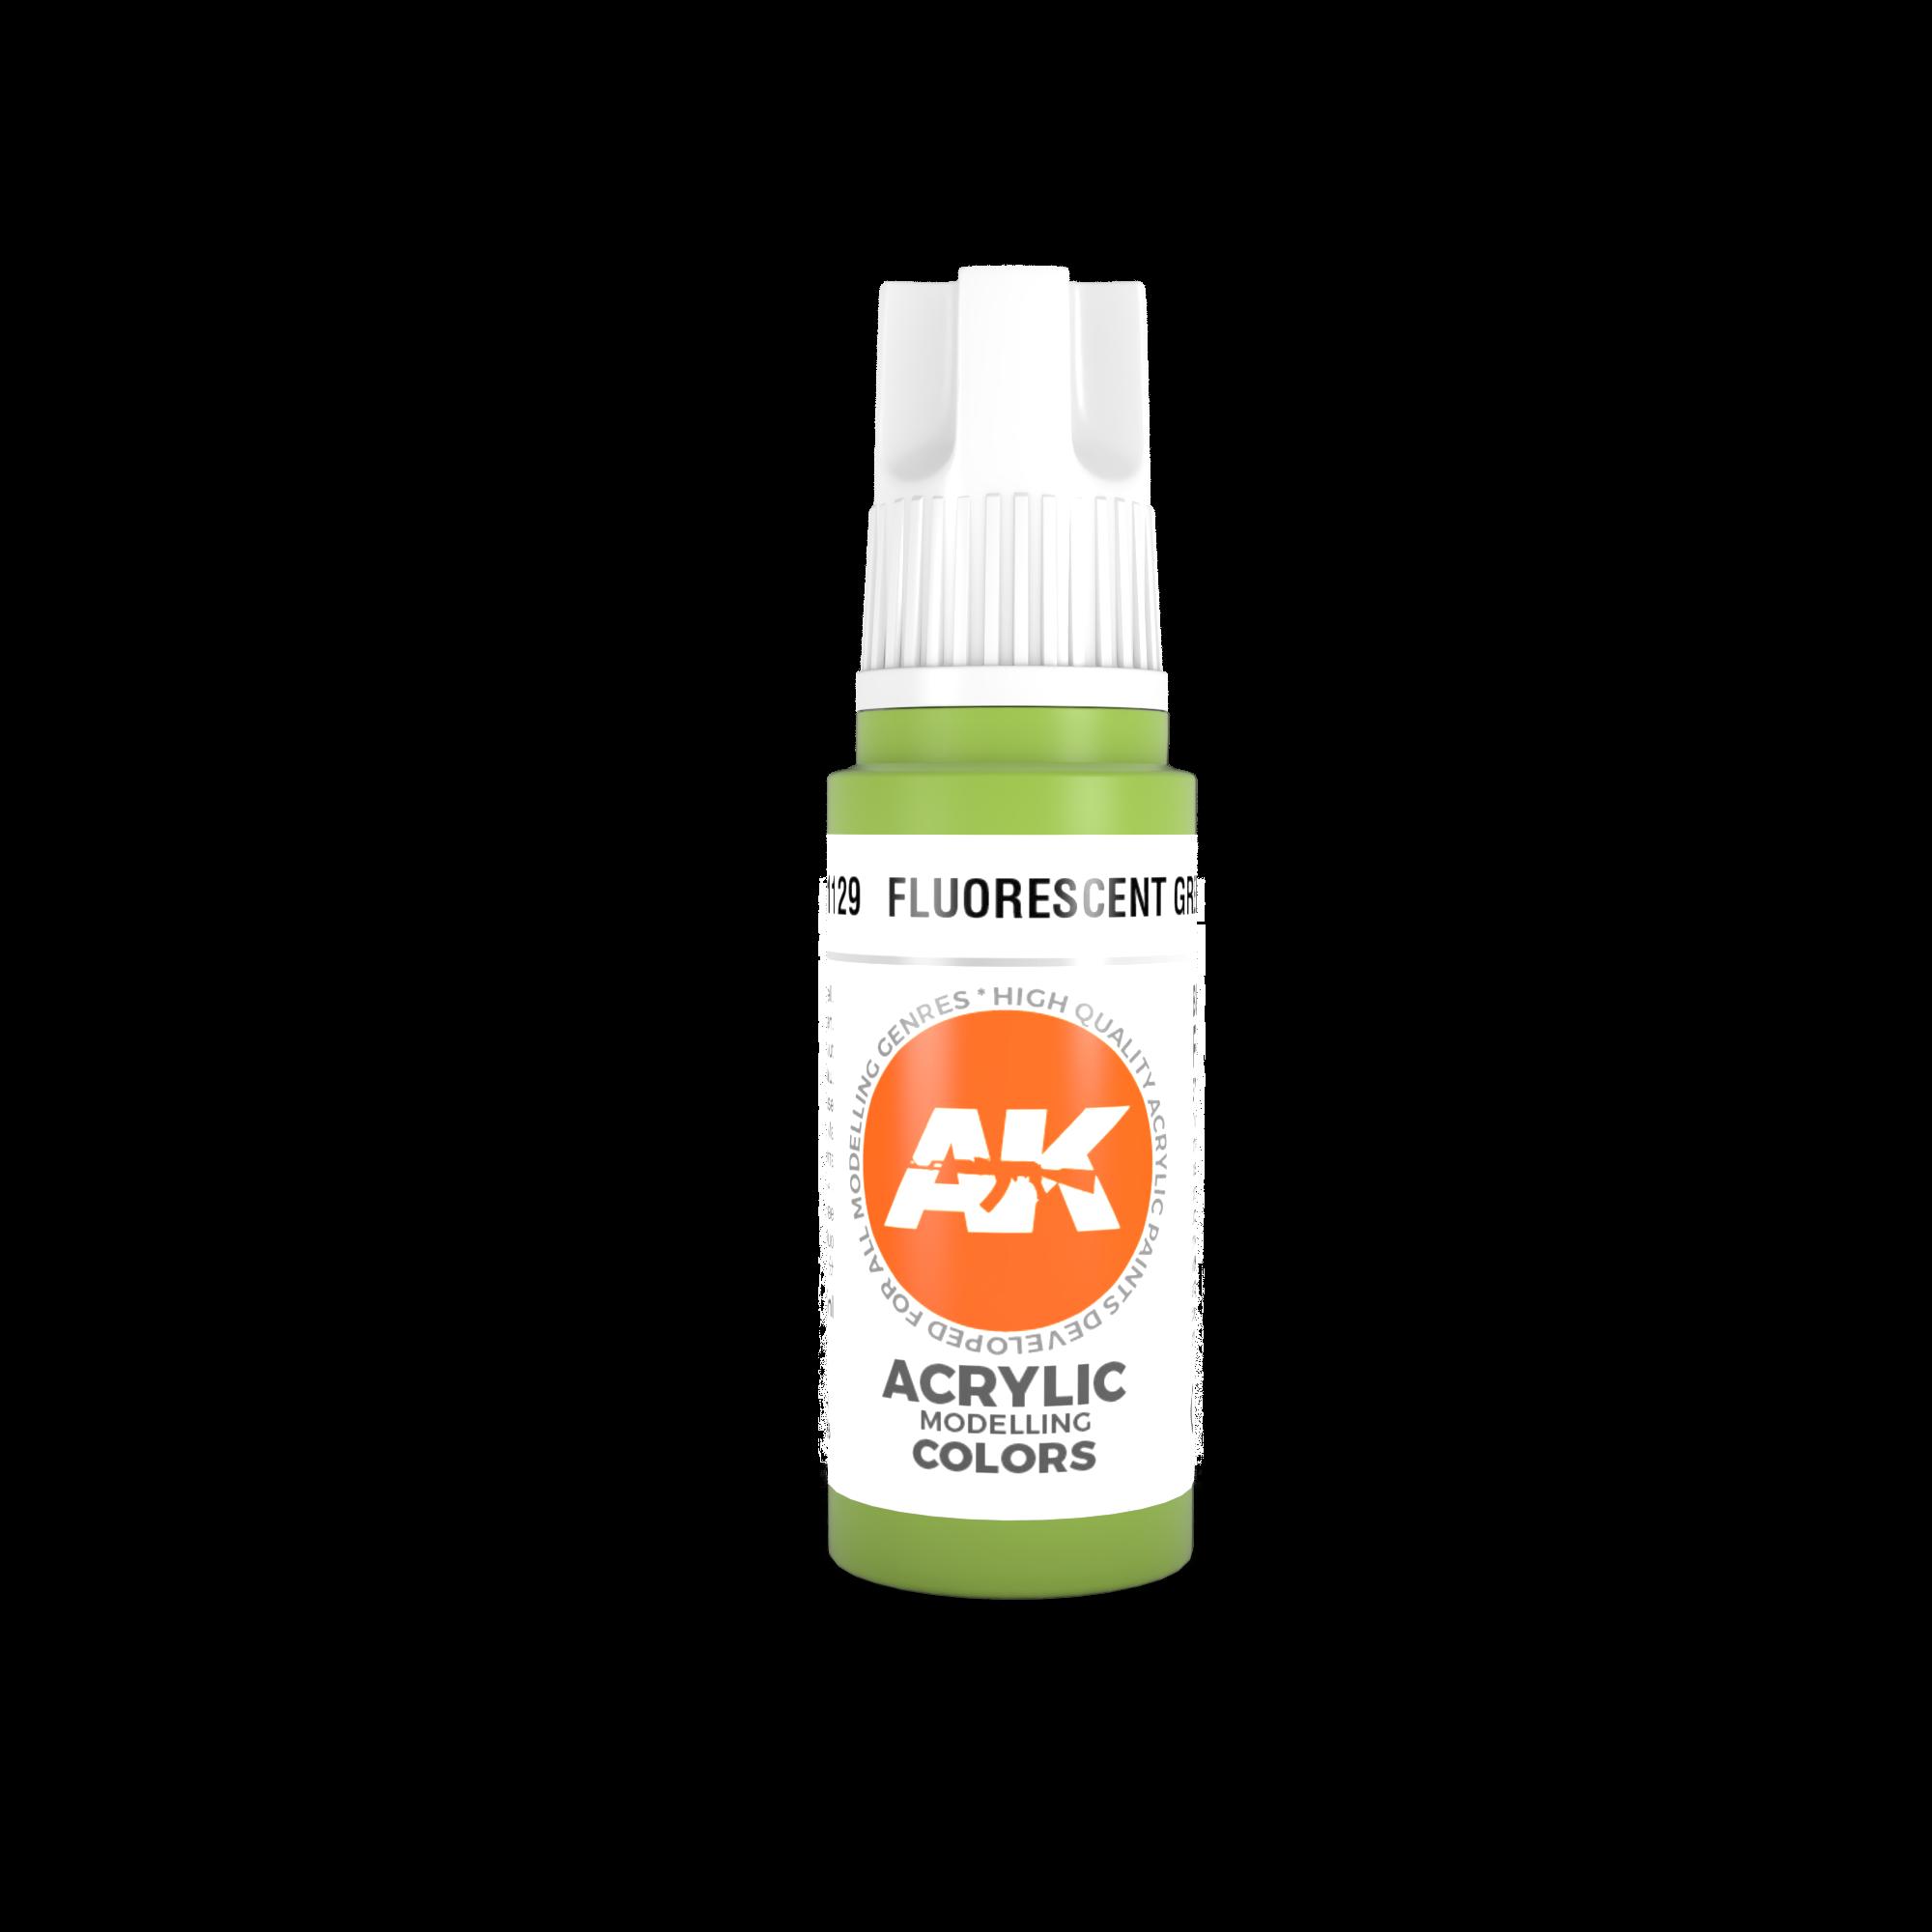 AK-Interactive Fluorescent Green Acrylic Modelling Color - 17ml - AK-11129